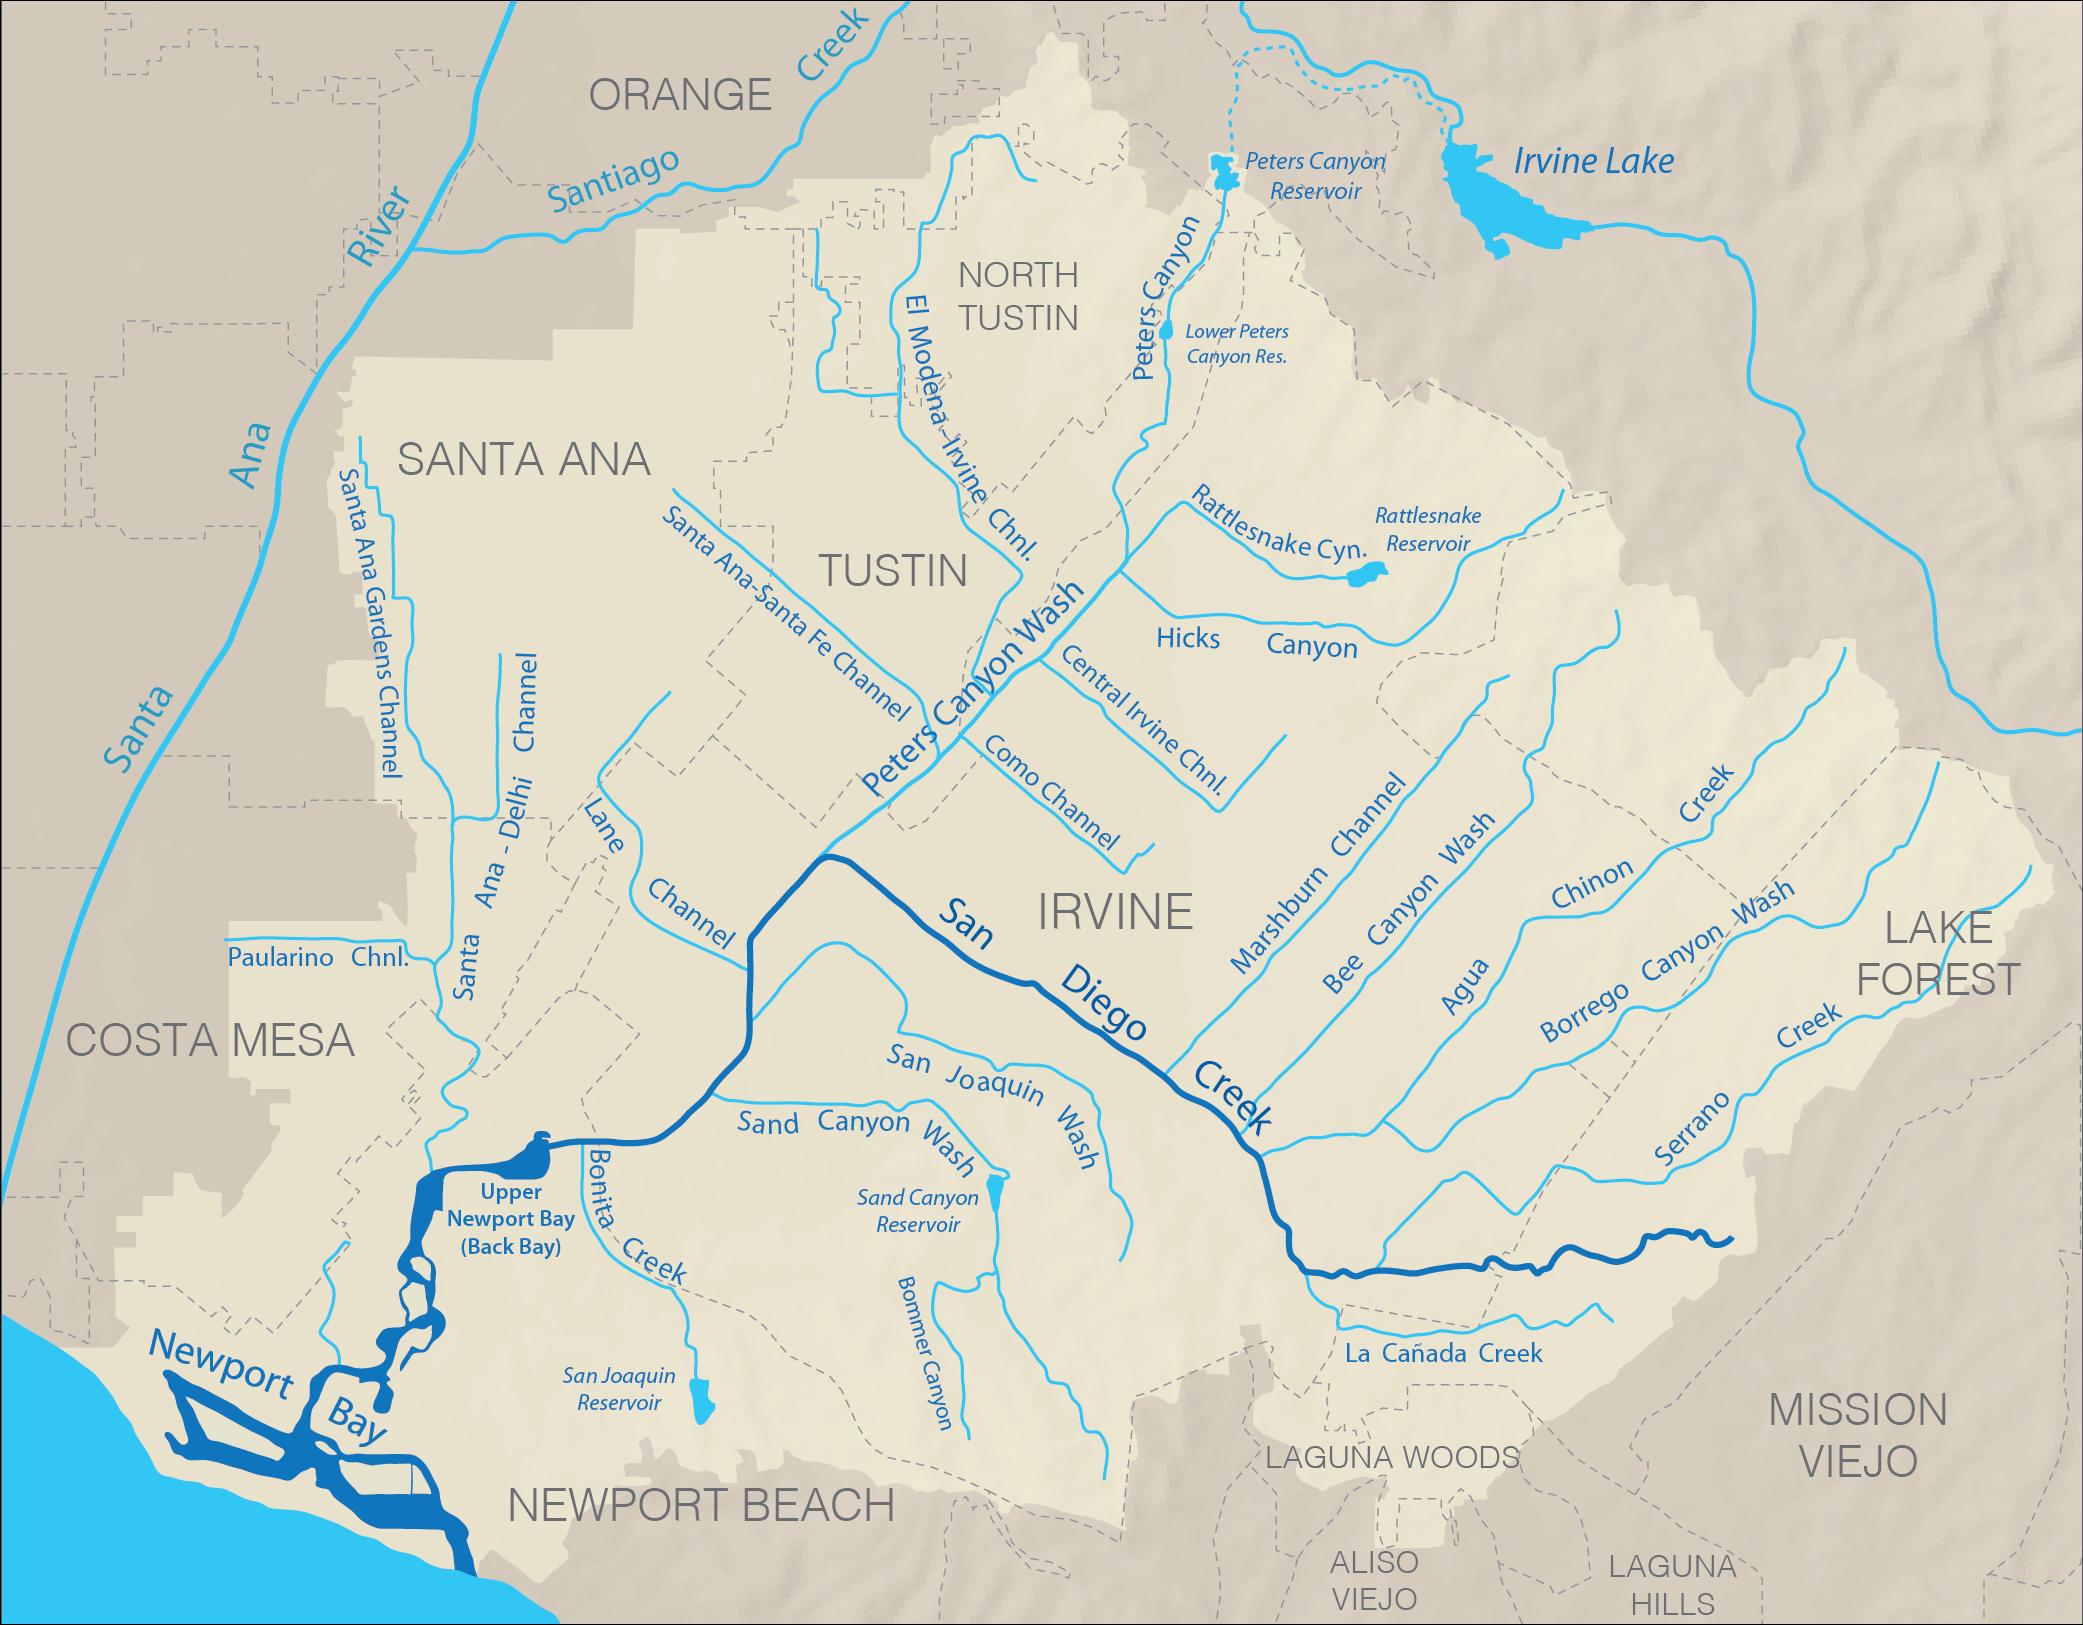 FileNEWPORT WATERSHED MAPpng Wikimedia Commons